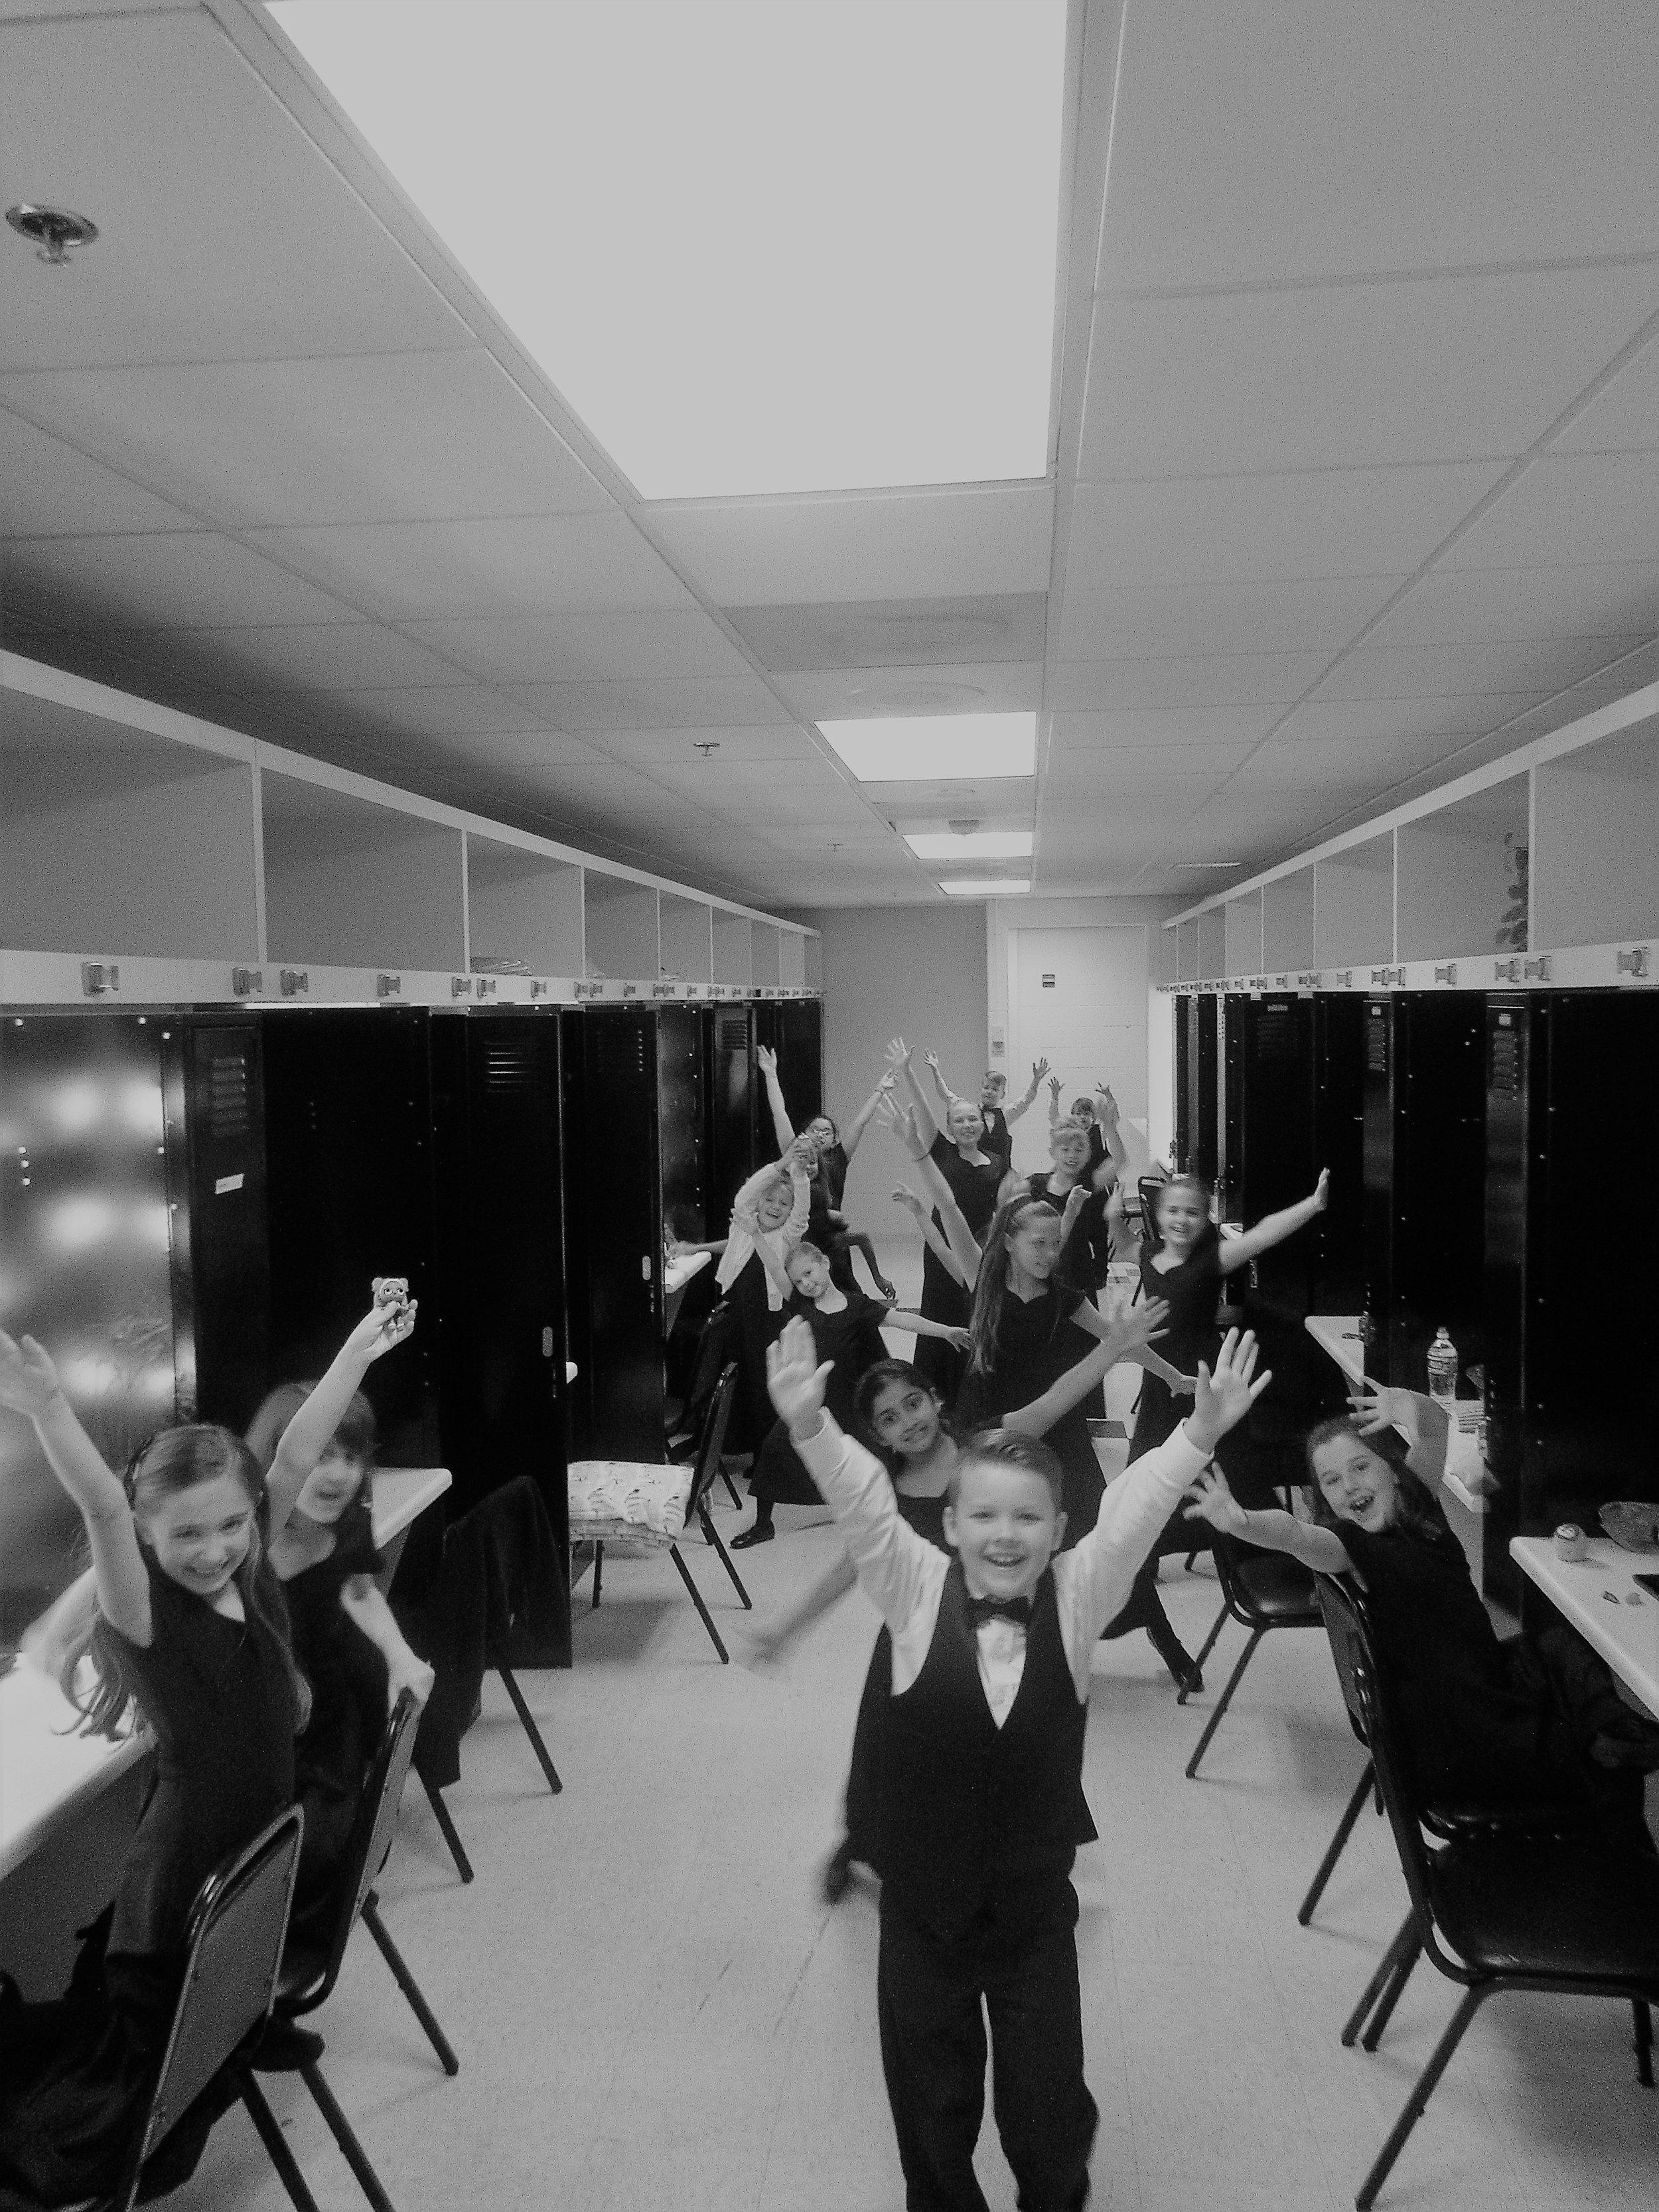 A Choir in their Dressing Room Backstage!